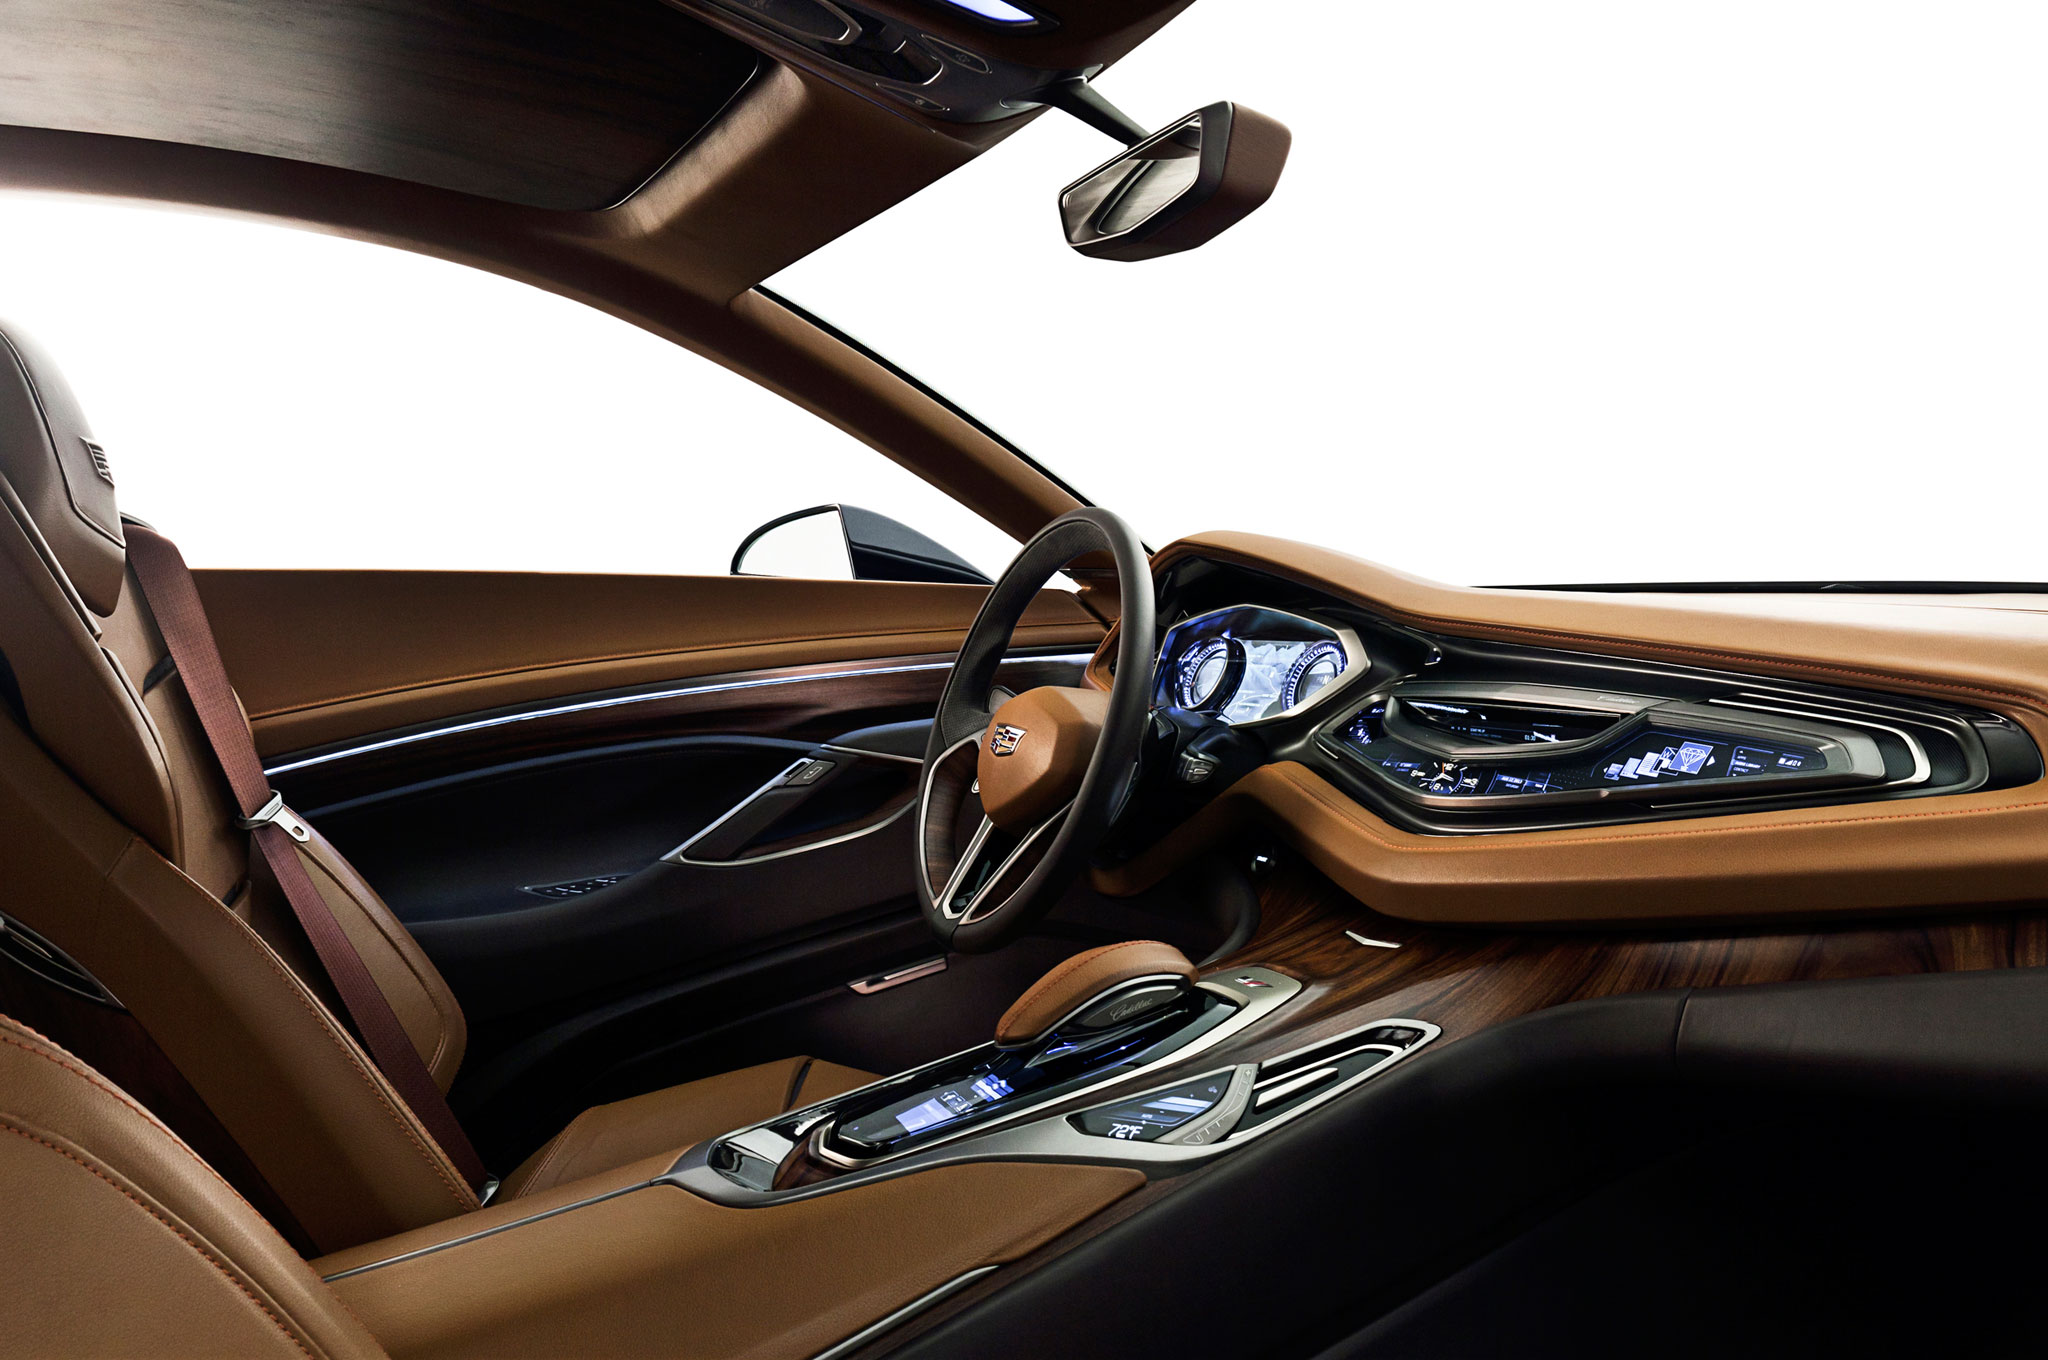 2013-Cadillac-Elmiraj-concept-front-interior-2